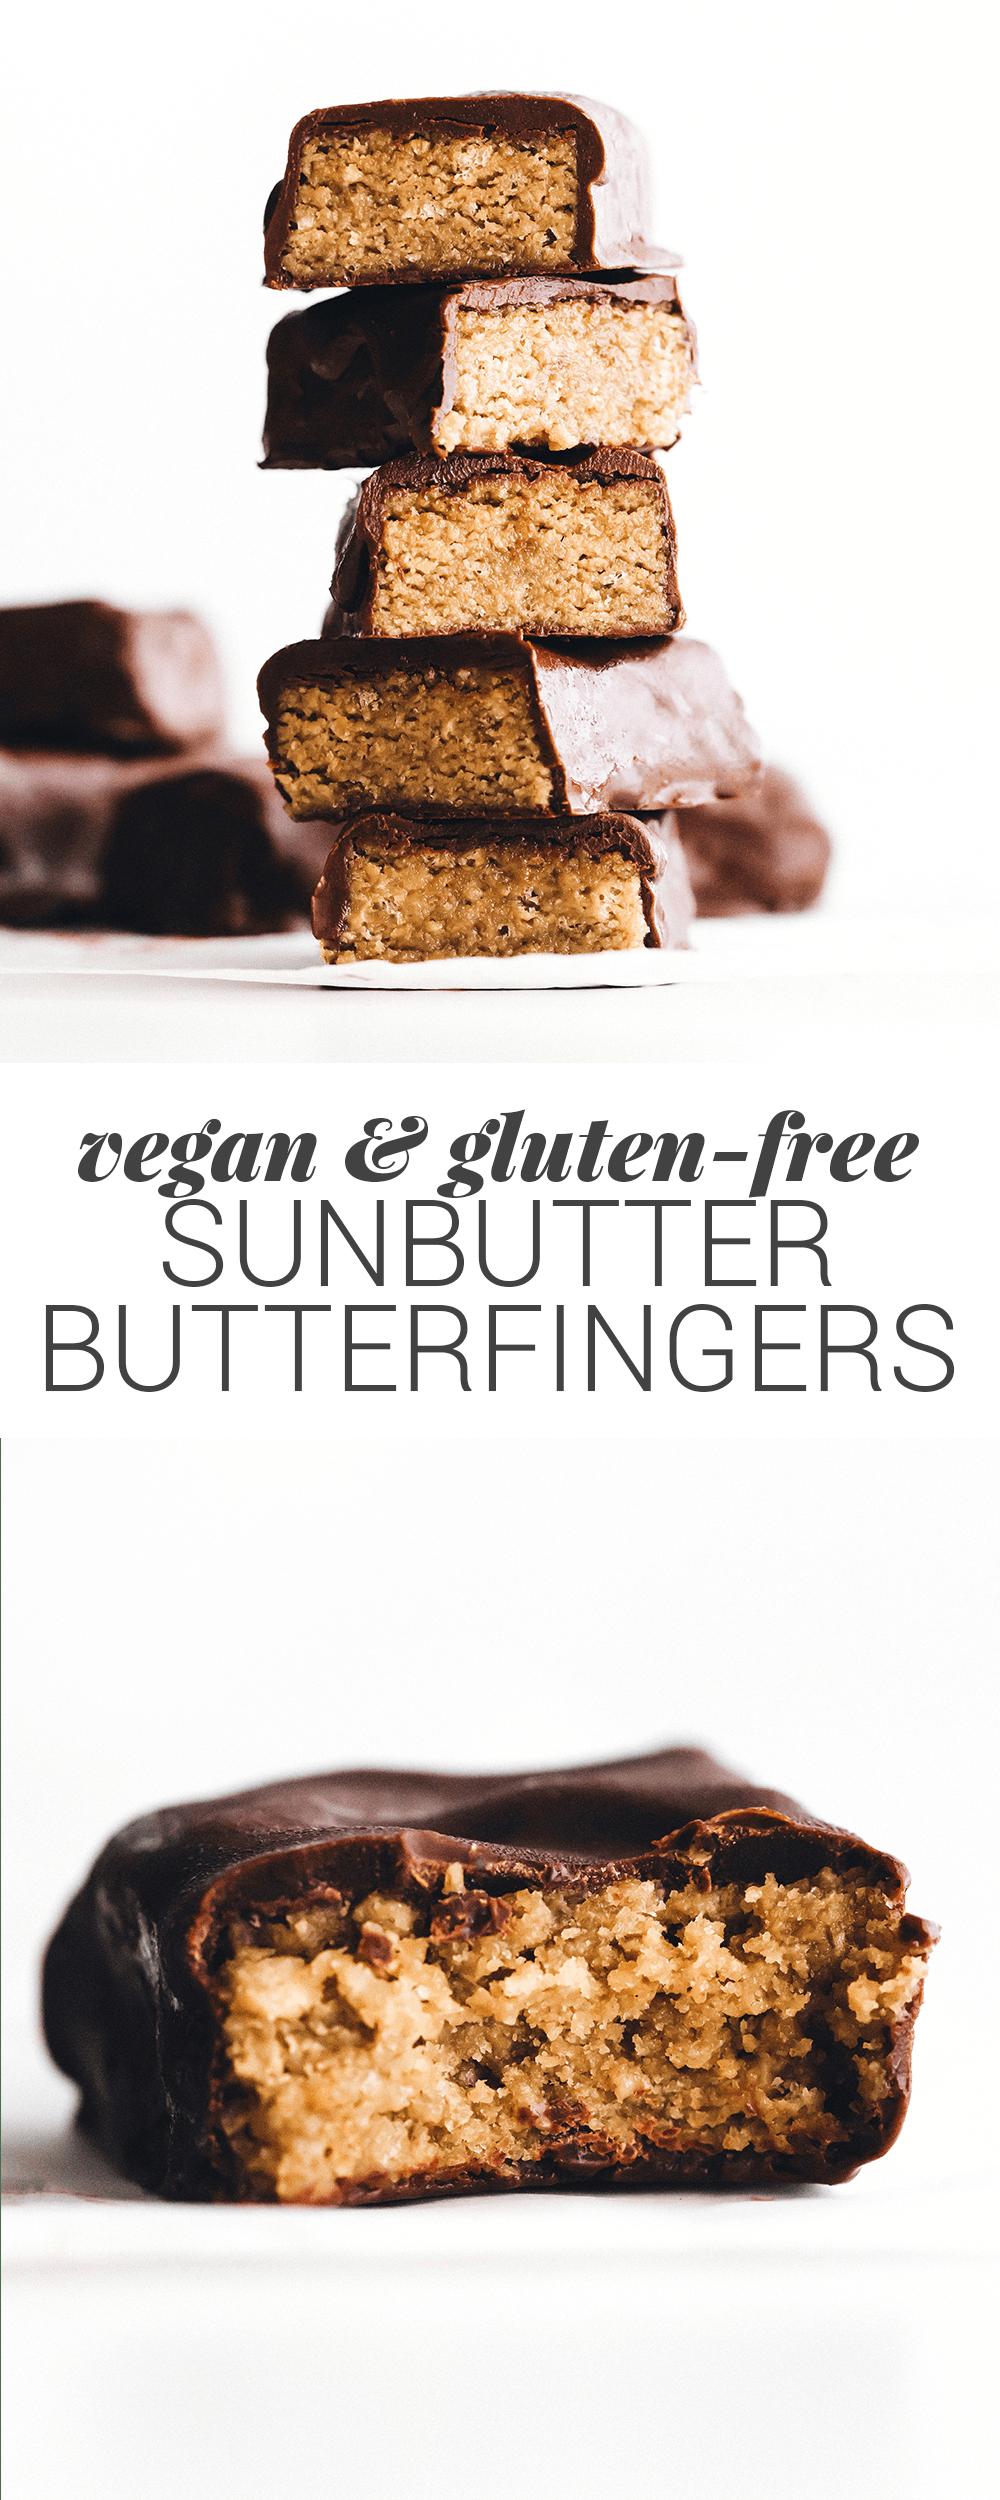 Sunbutter Butterfingers Recipe Healthy Vegan Desserts Butterfinger Recipes Quick Healthy Desserts